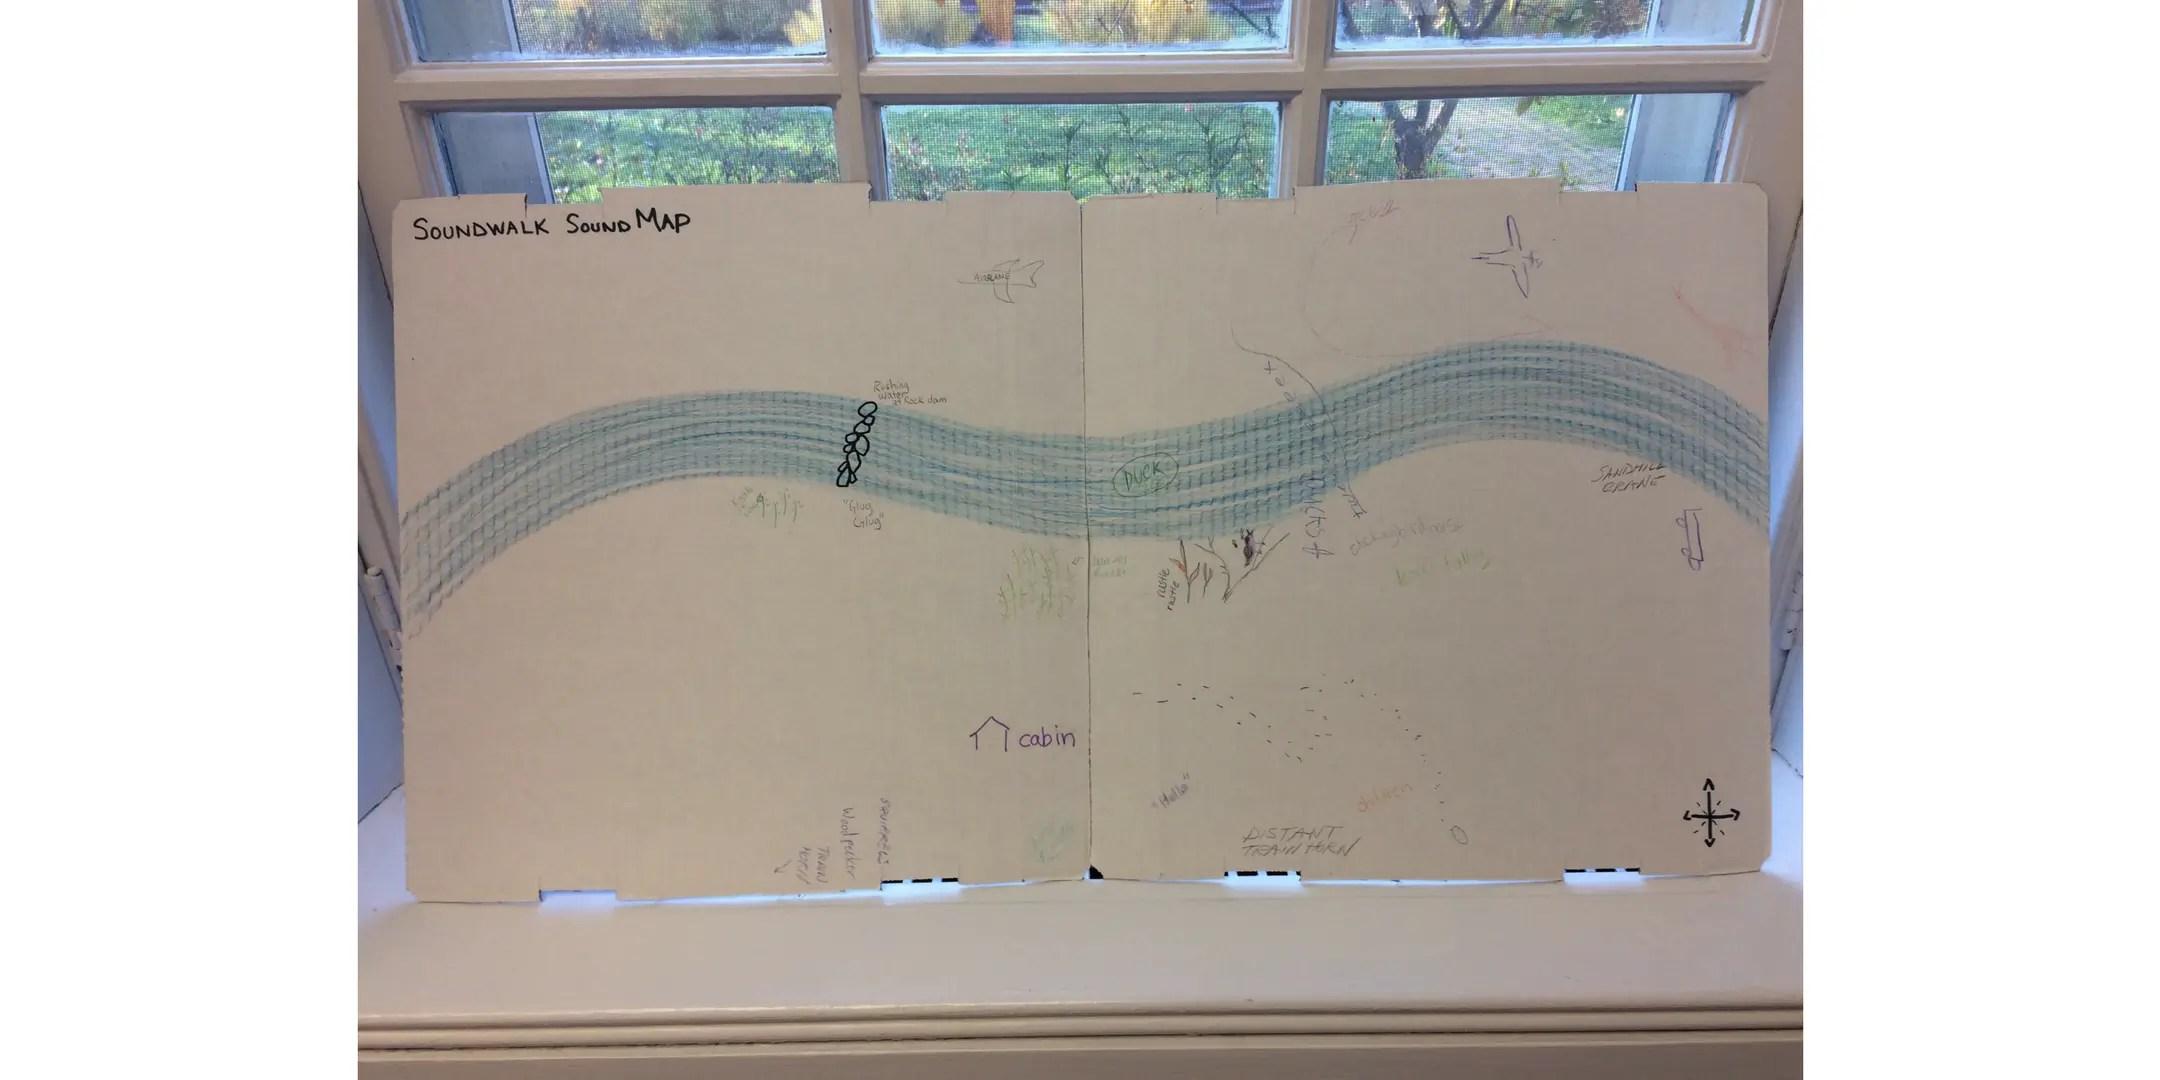 Ryerson Woods Soundwalk Map